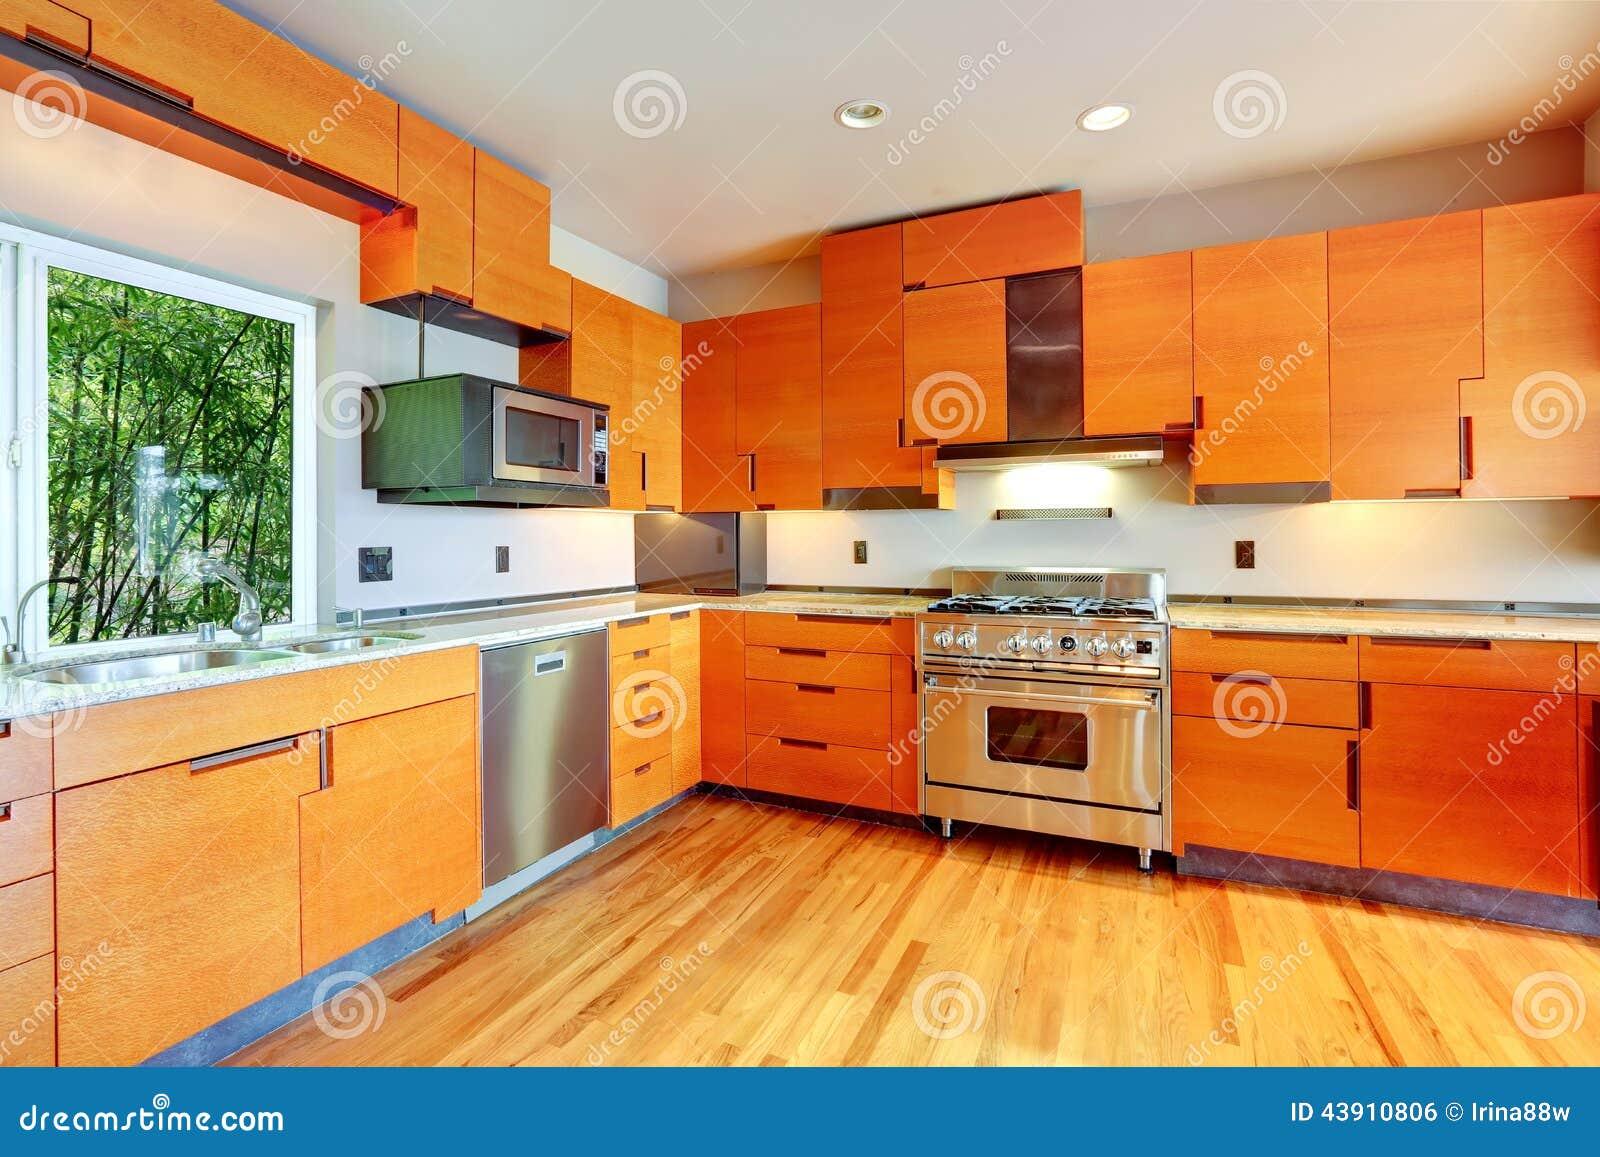 Modern Bright Orange Kitchen Room Stock Photo - Image of ...